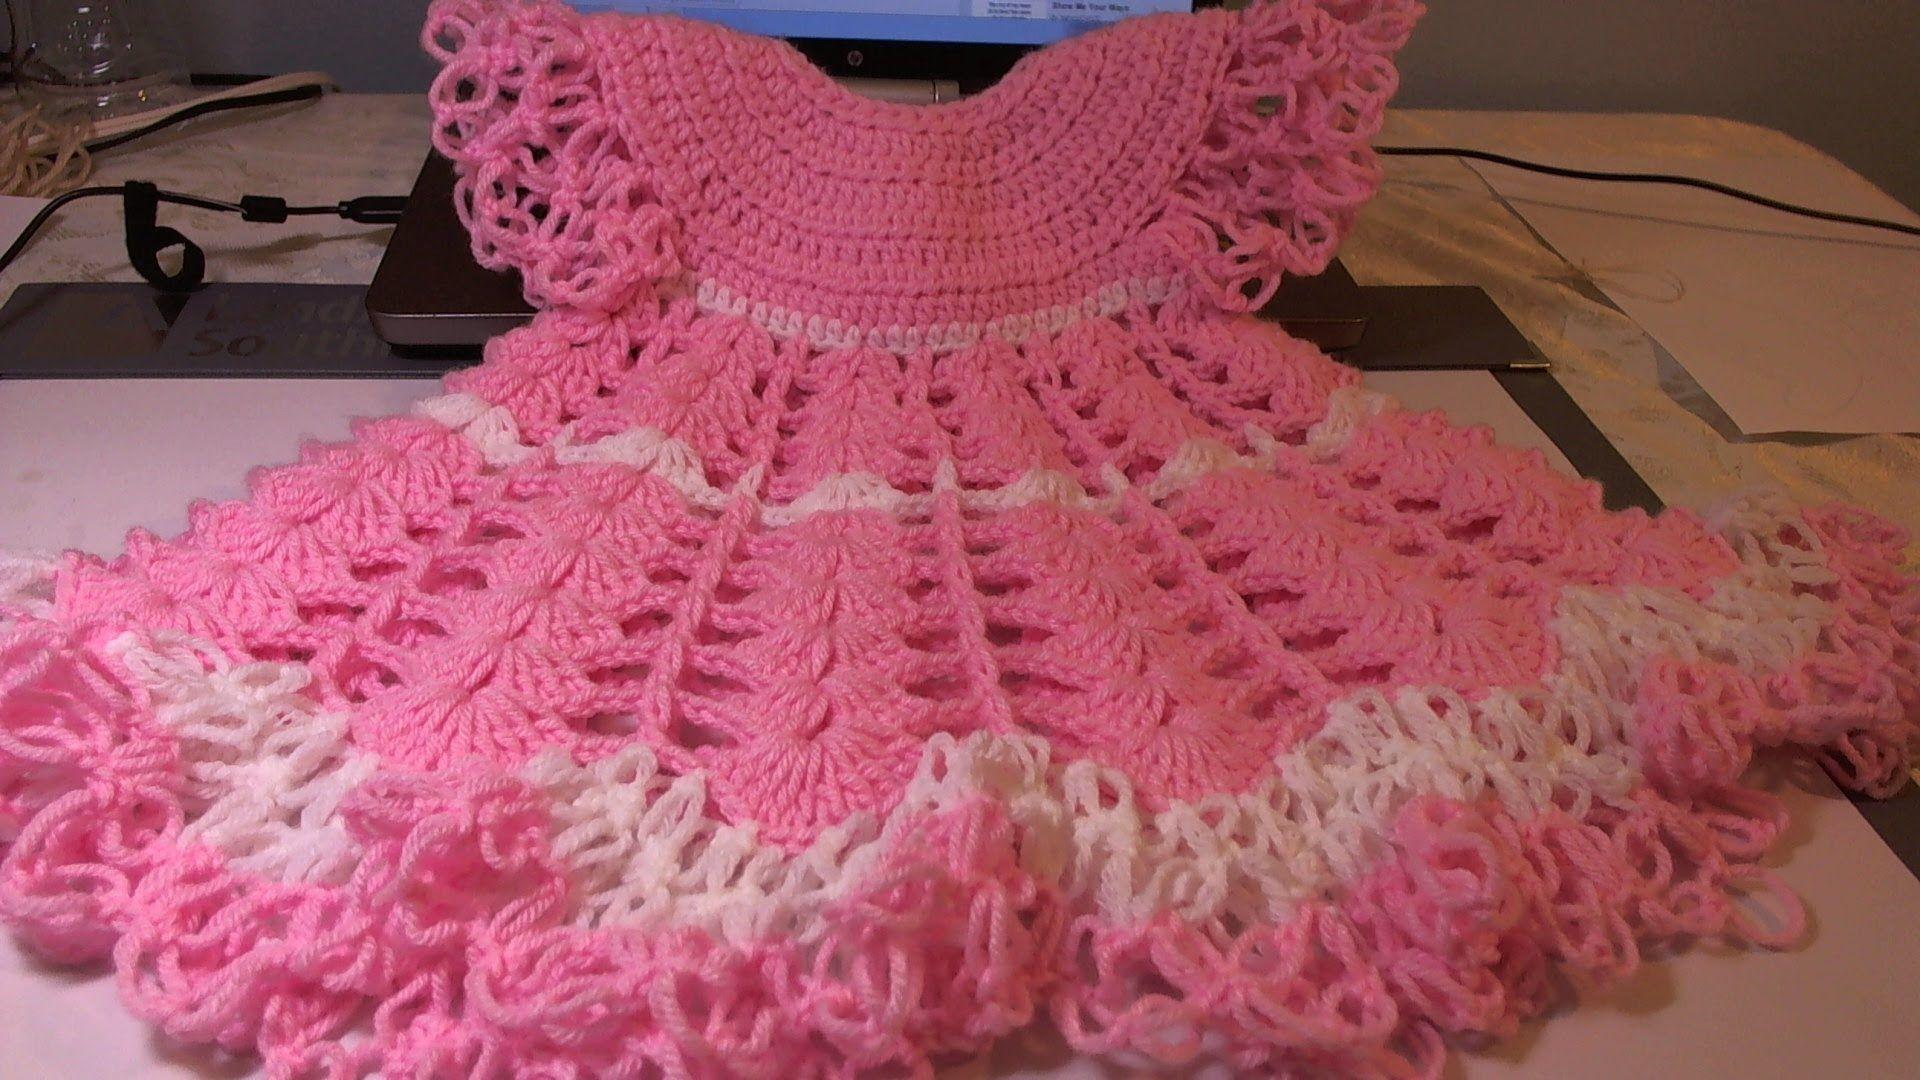 Crochet Baby Dress/ Shells and lacy dress - Video 1 / subtitulos en espanol